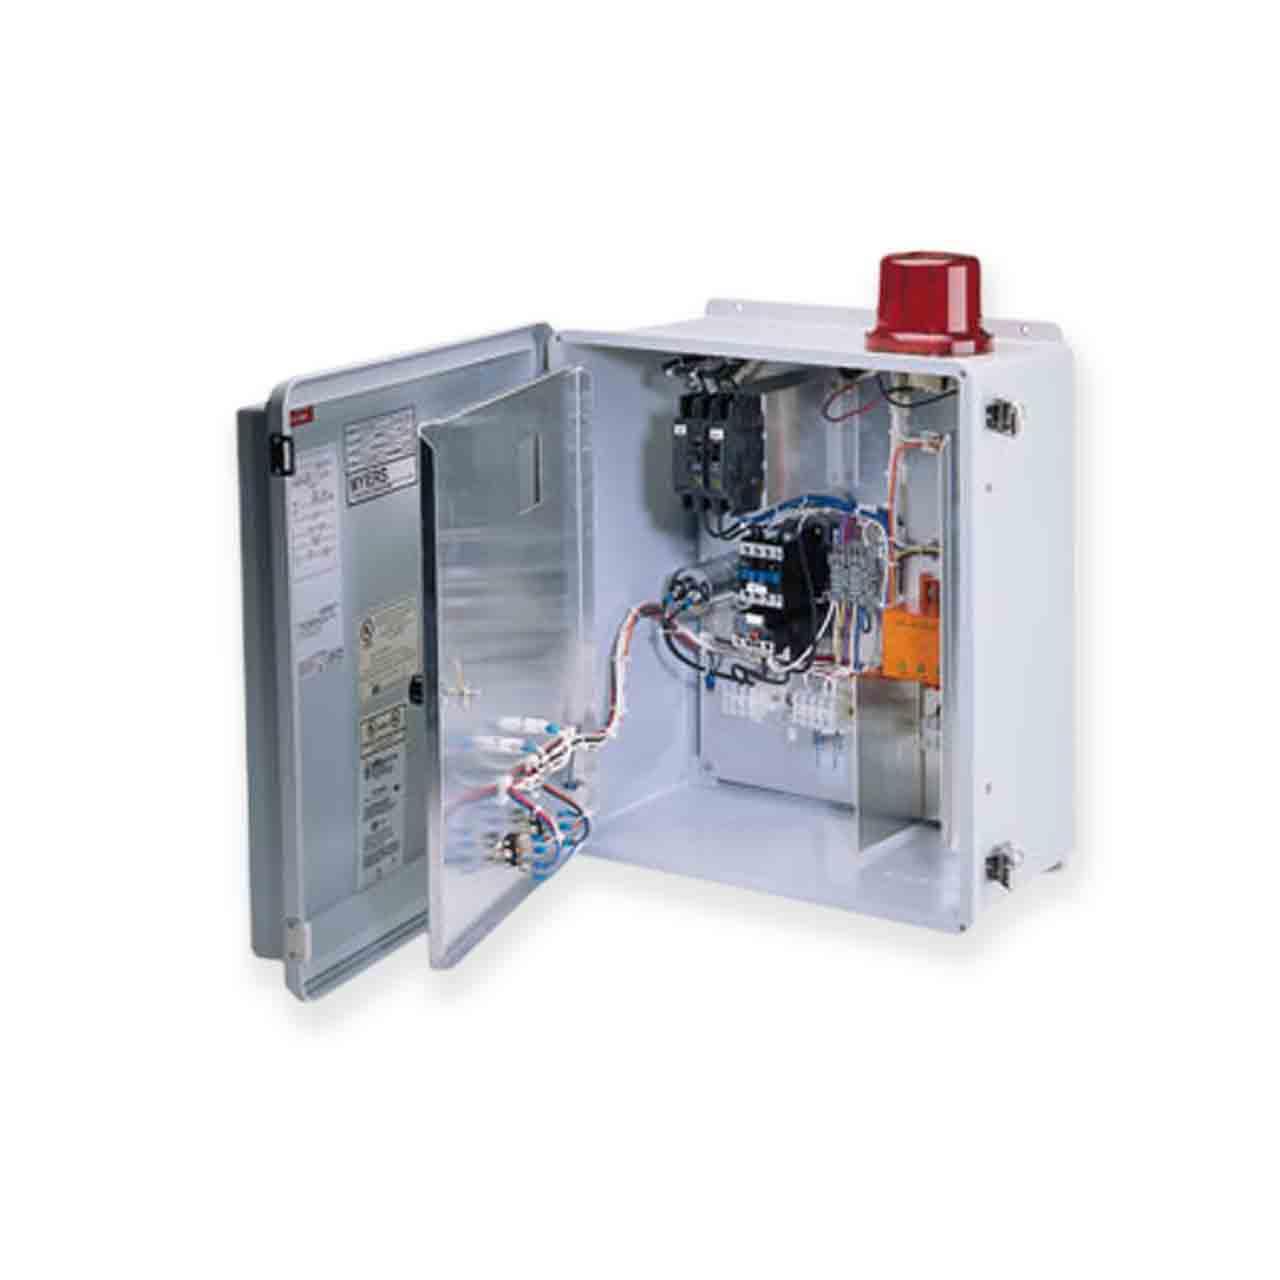 myrcecontrolpanel_001_wbg myers myers ce 23dw nema 4x duplex outdoor control panel 230v 3ph